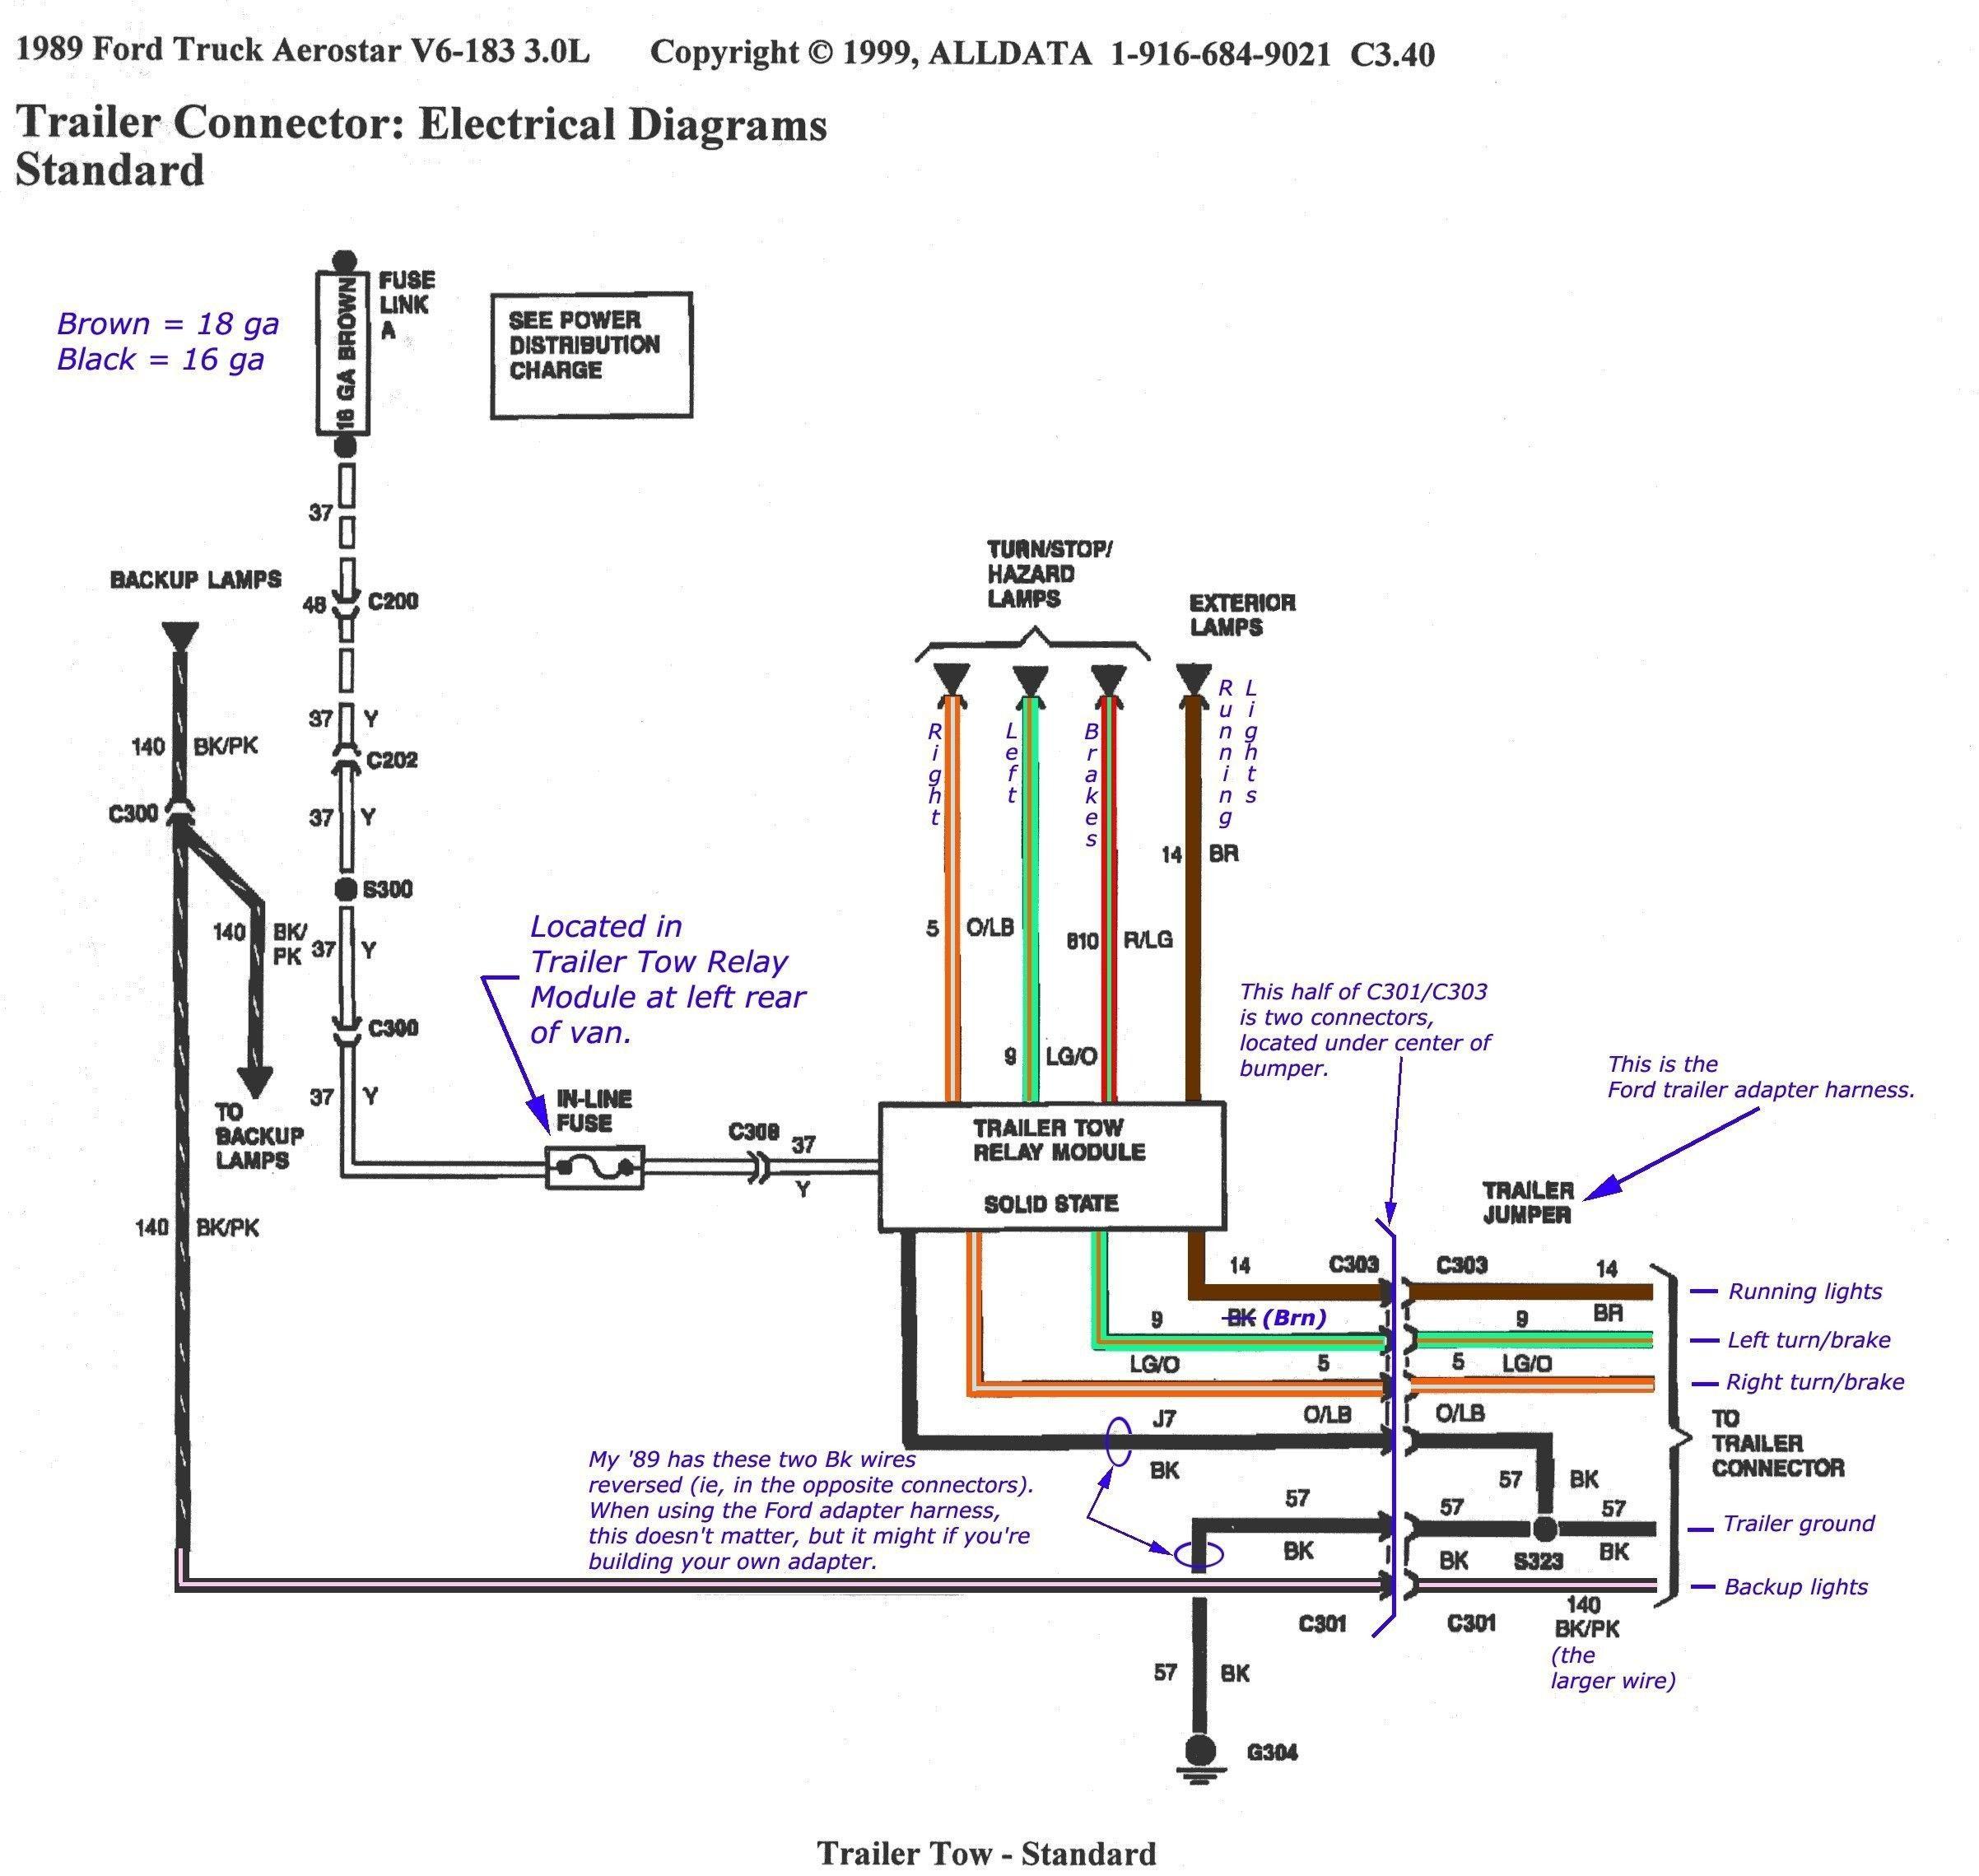 Chevy Silverado Trailer Wiring Diagram Elegant In 2020 Trailer Wiring Diagram Trailer Light Wiring Electrical Wiring Diagram